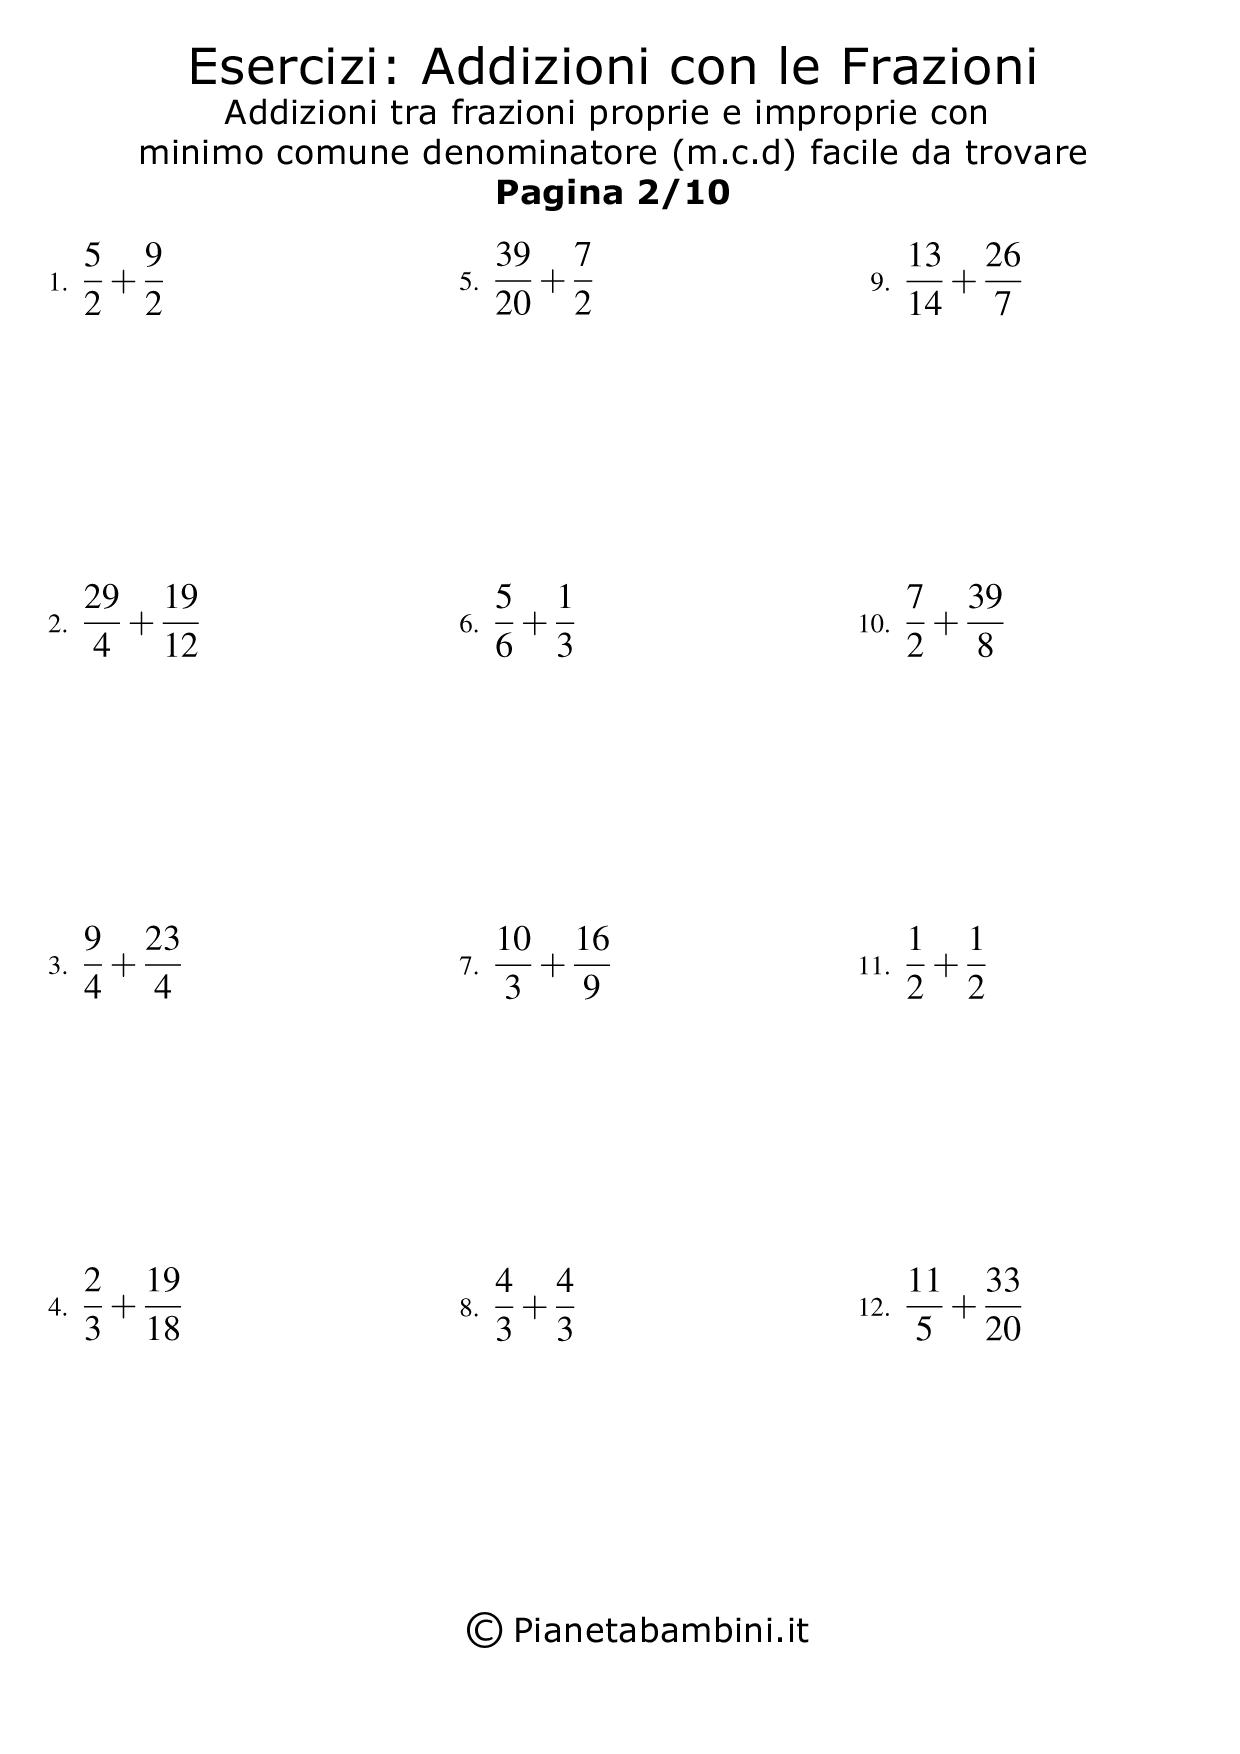 Frazioni-Prorpie-Improprie-m.c.d-Facile_02